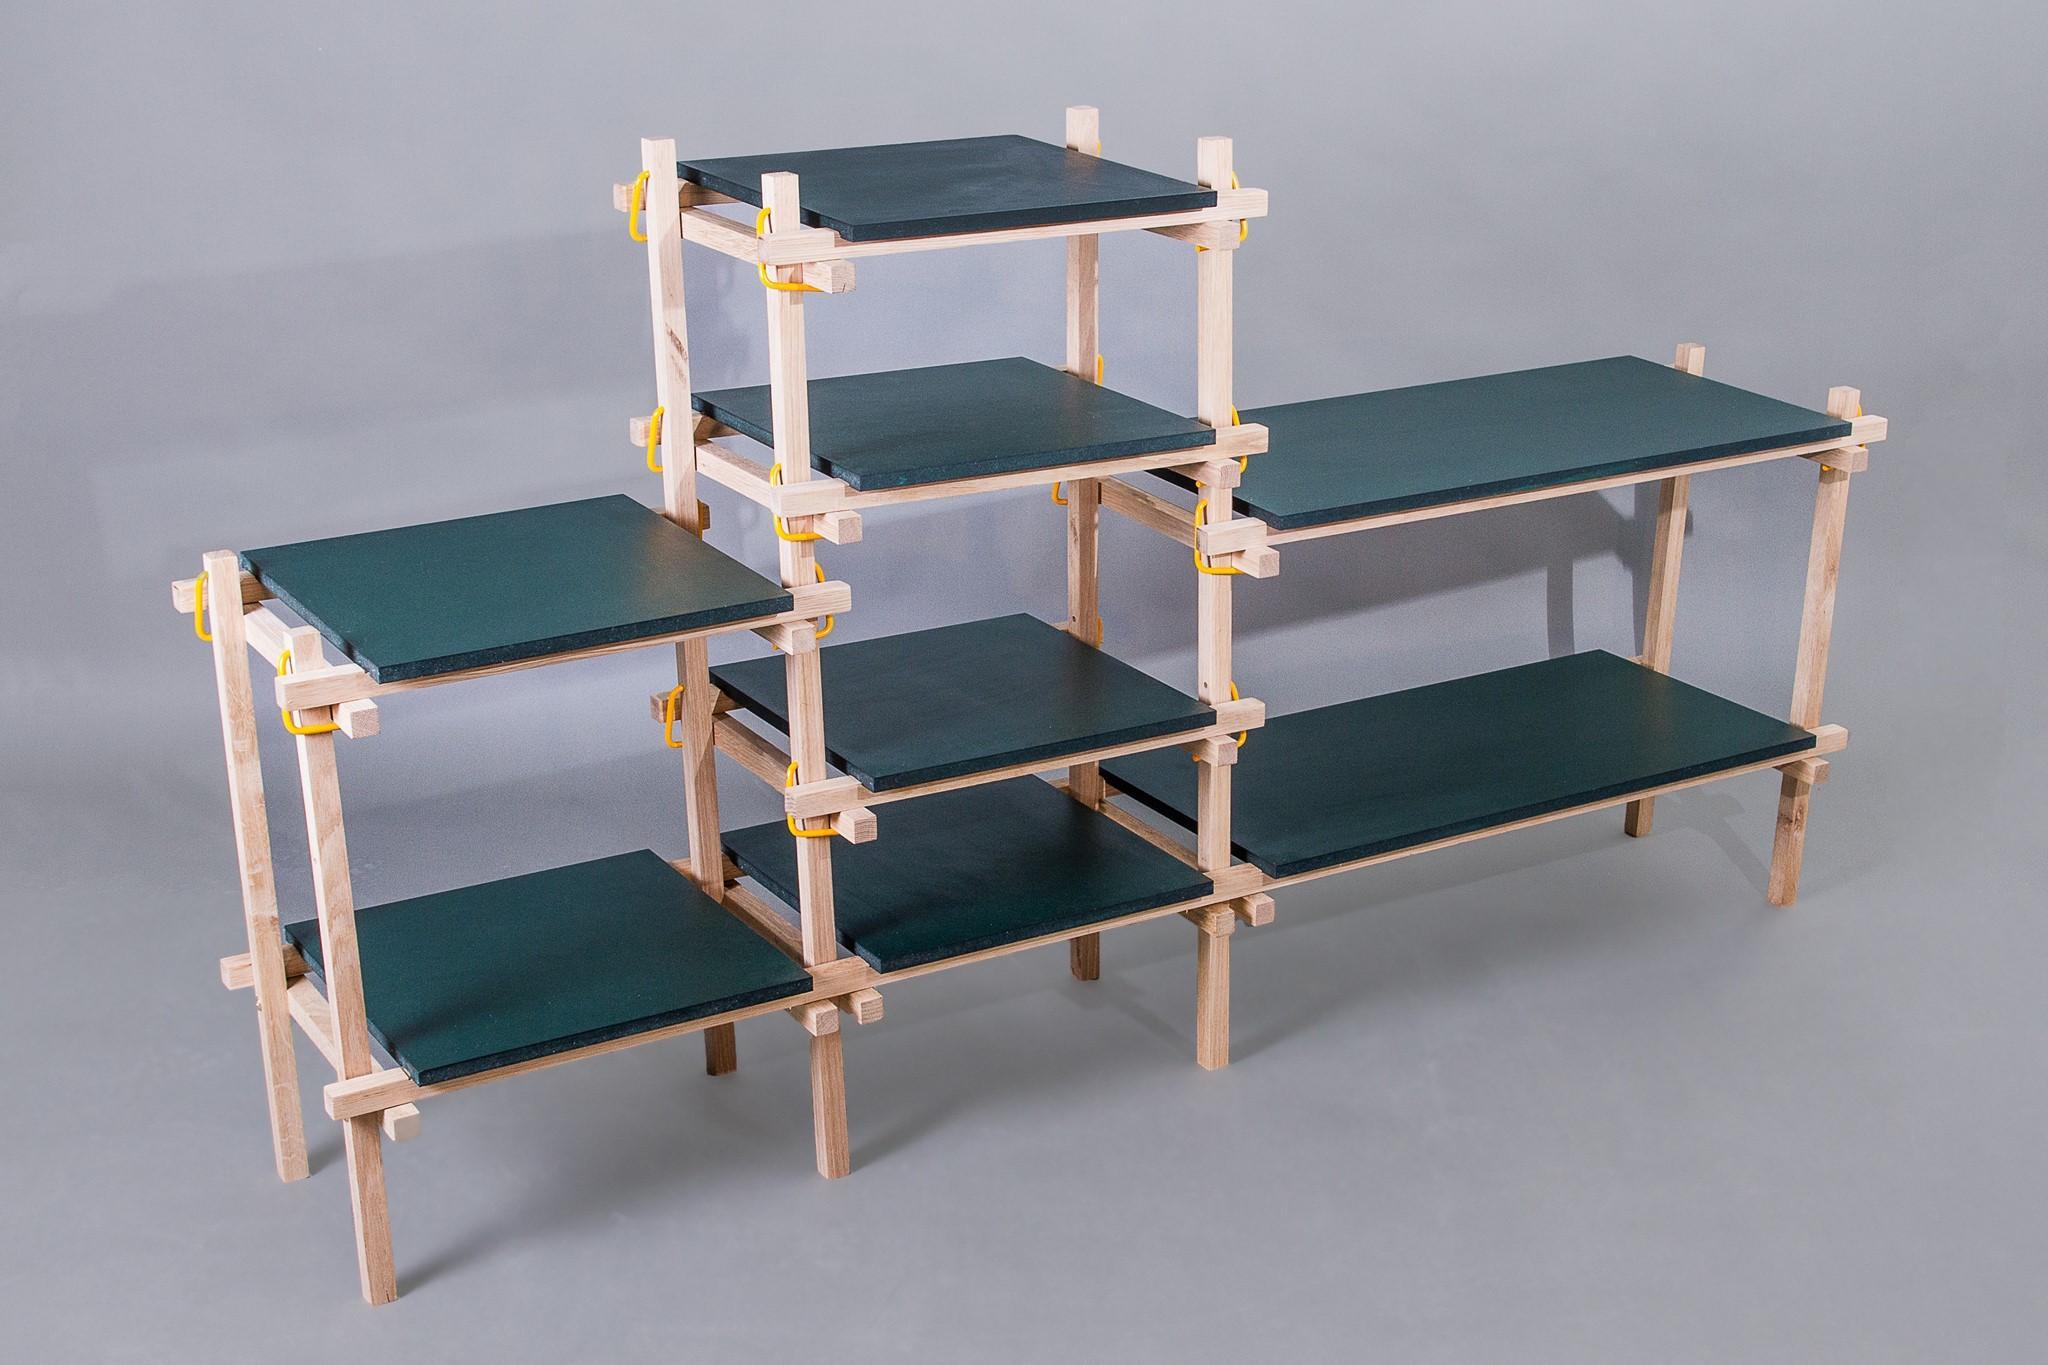 furniture-for-a-norvegian-prisiners11